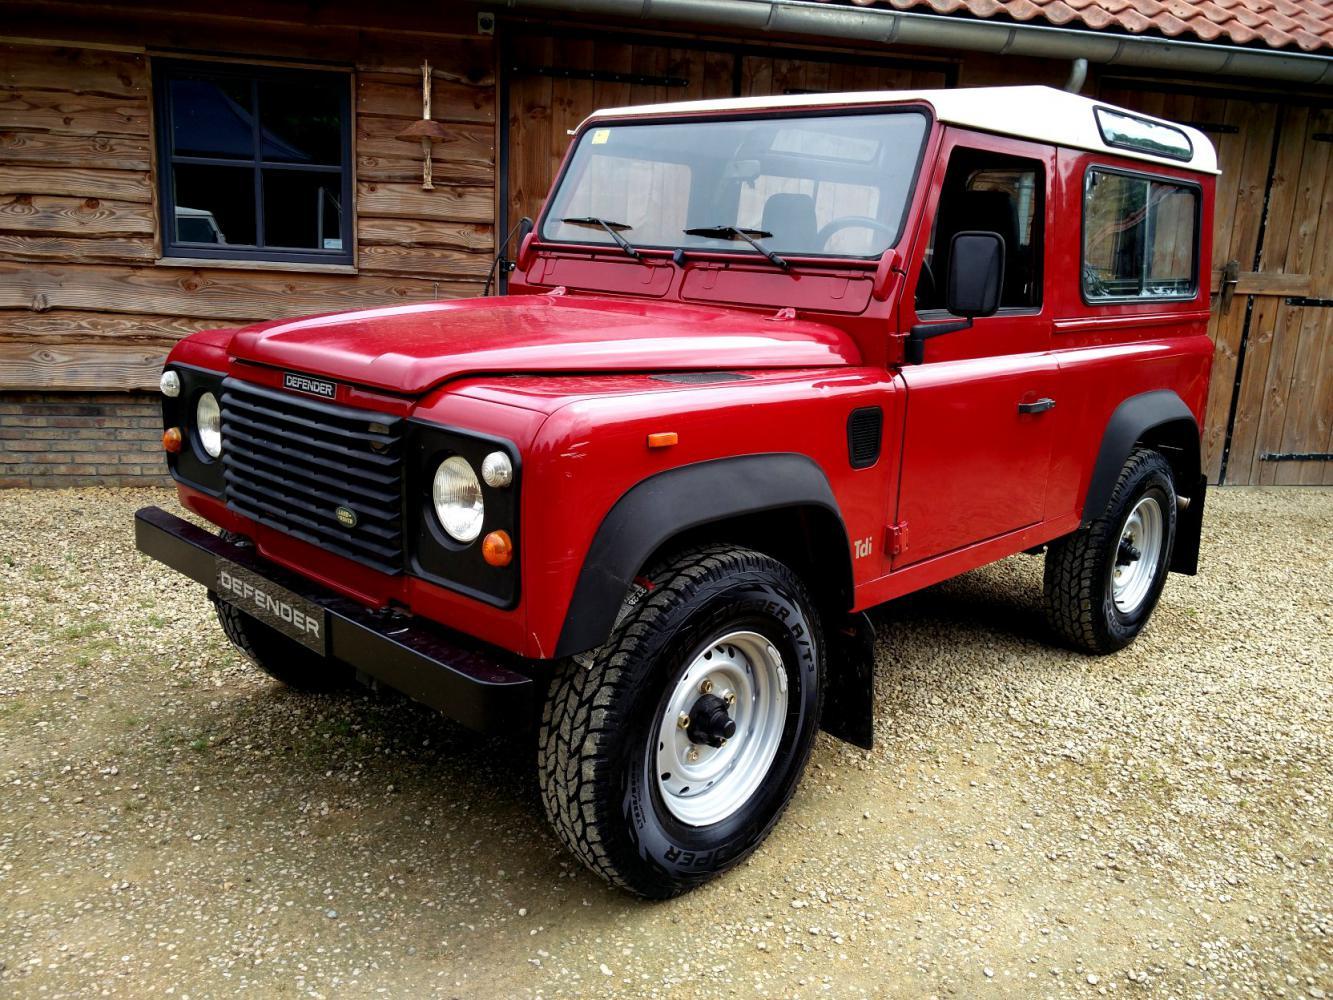 Click image for larger version  Name:1992 LR LHD Defender 90 Red 200 Tdi left front.jpg Views:235 Size:273.2 KB ID:263634